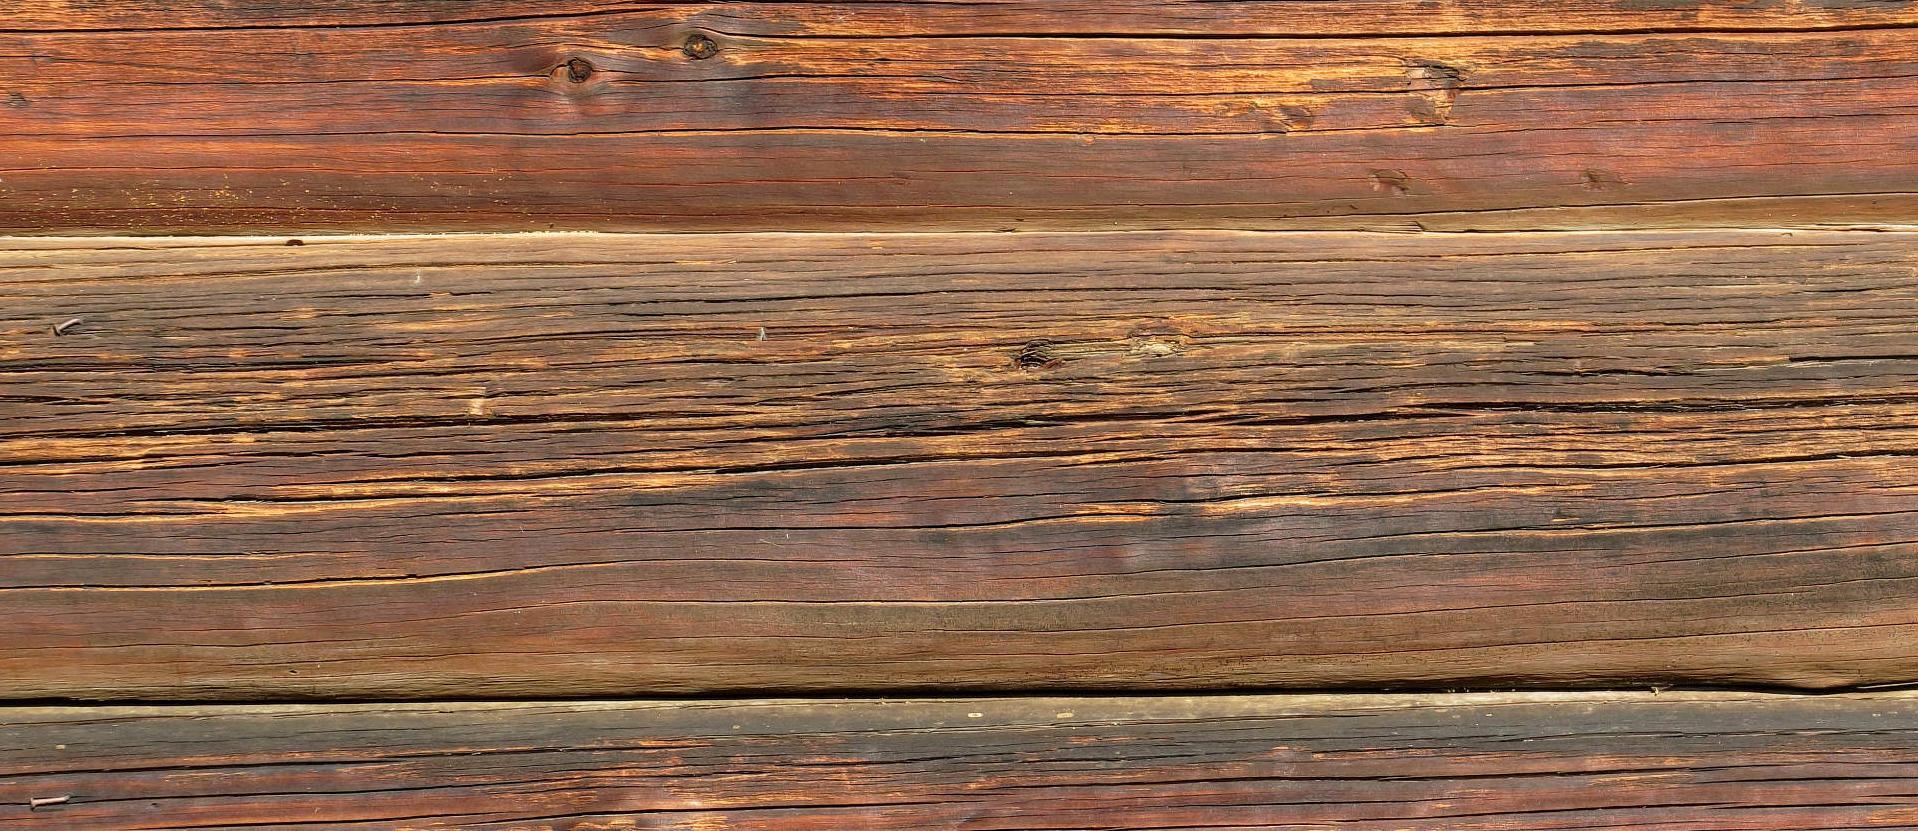 Como remover manchas de caneta da madeira